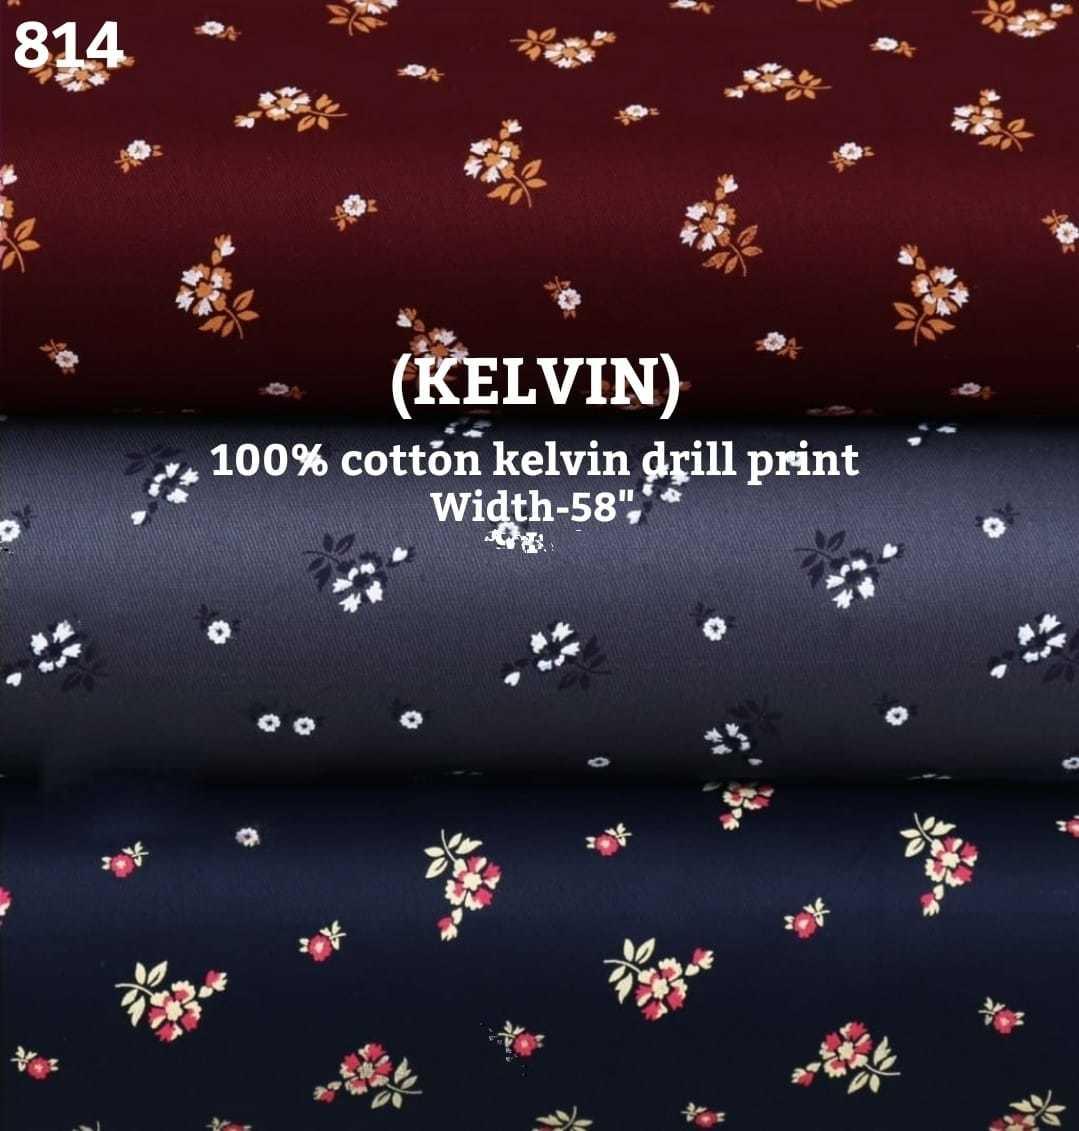 Kelvin 100% Cotton Kelvin Drill Print Shirting Fabric